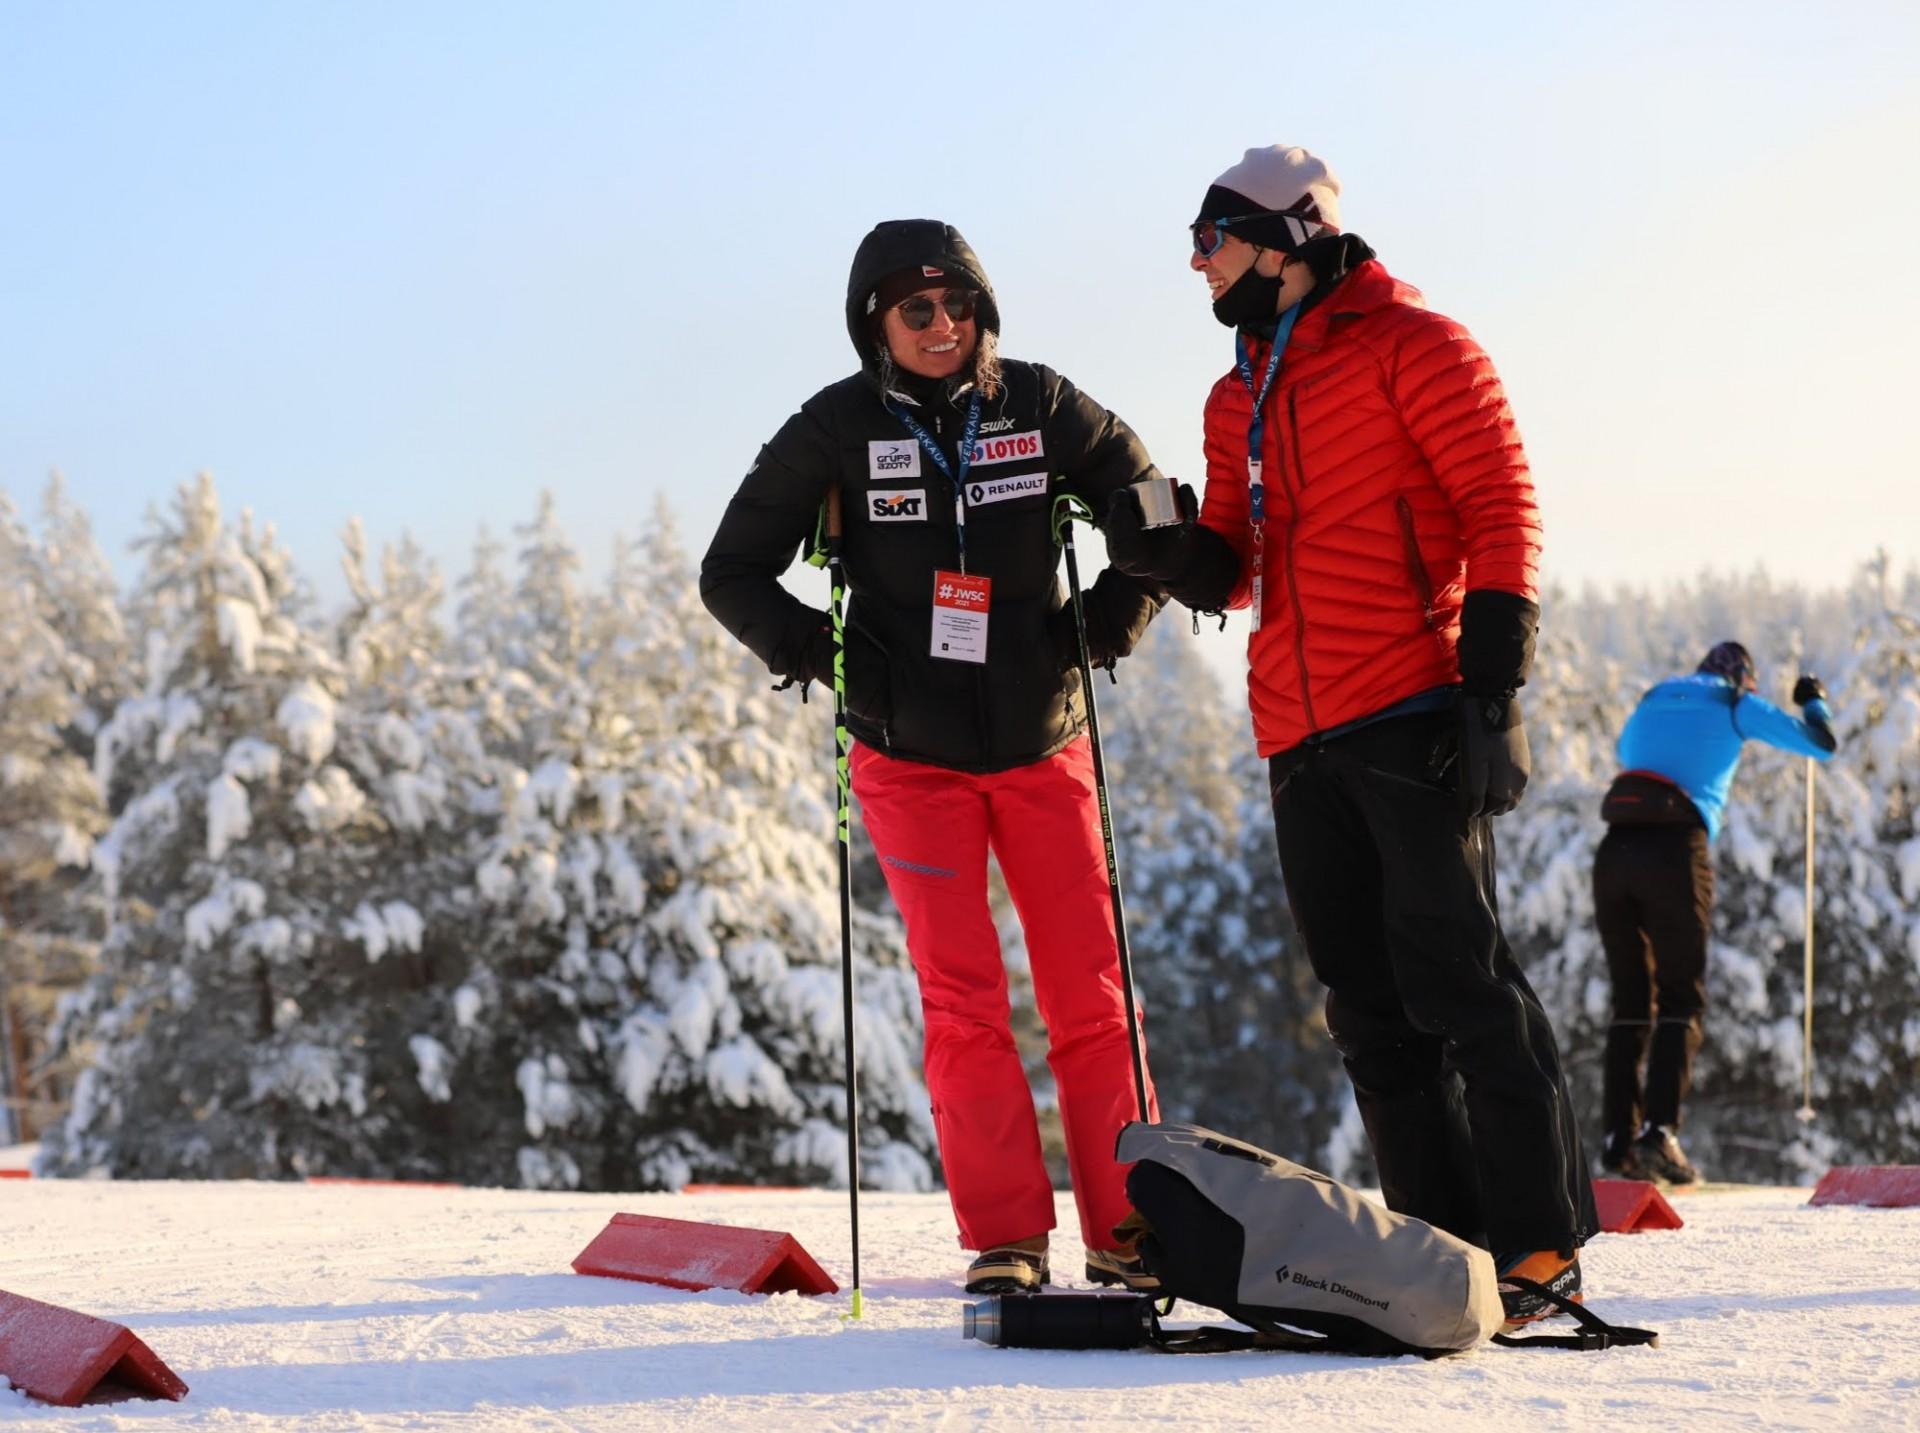 Justyna Kowalczyk and Kacper Tekieli became wife & husband last year. Justyna is at JWSC as a coach of female Polish skiers